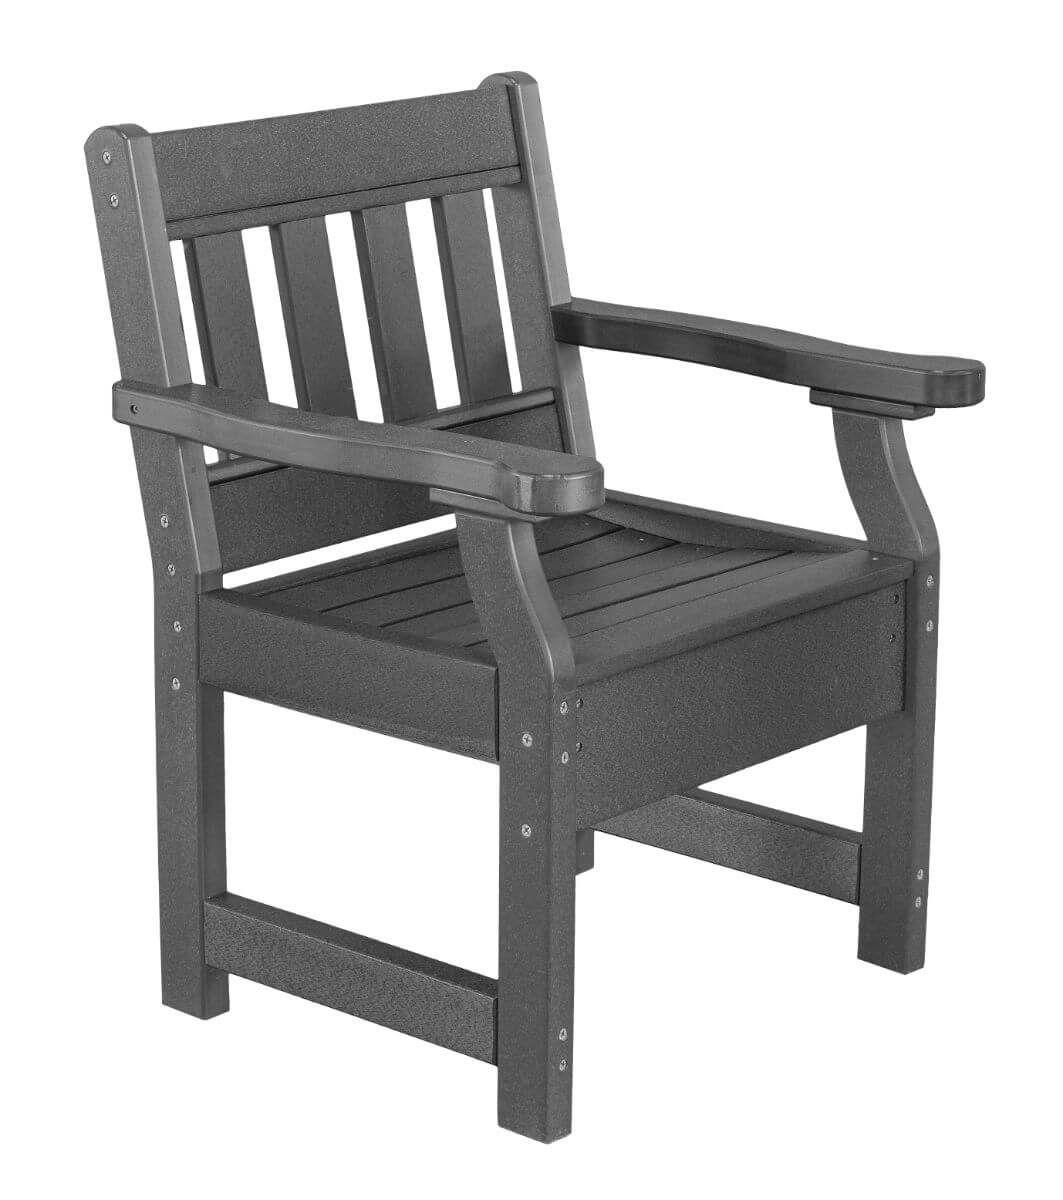 Dark Gray Aden Patio Chair